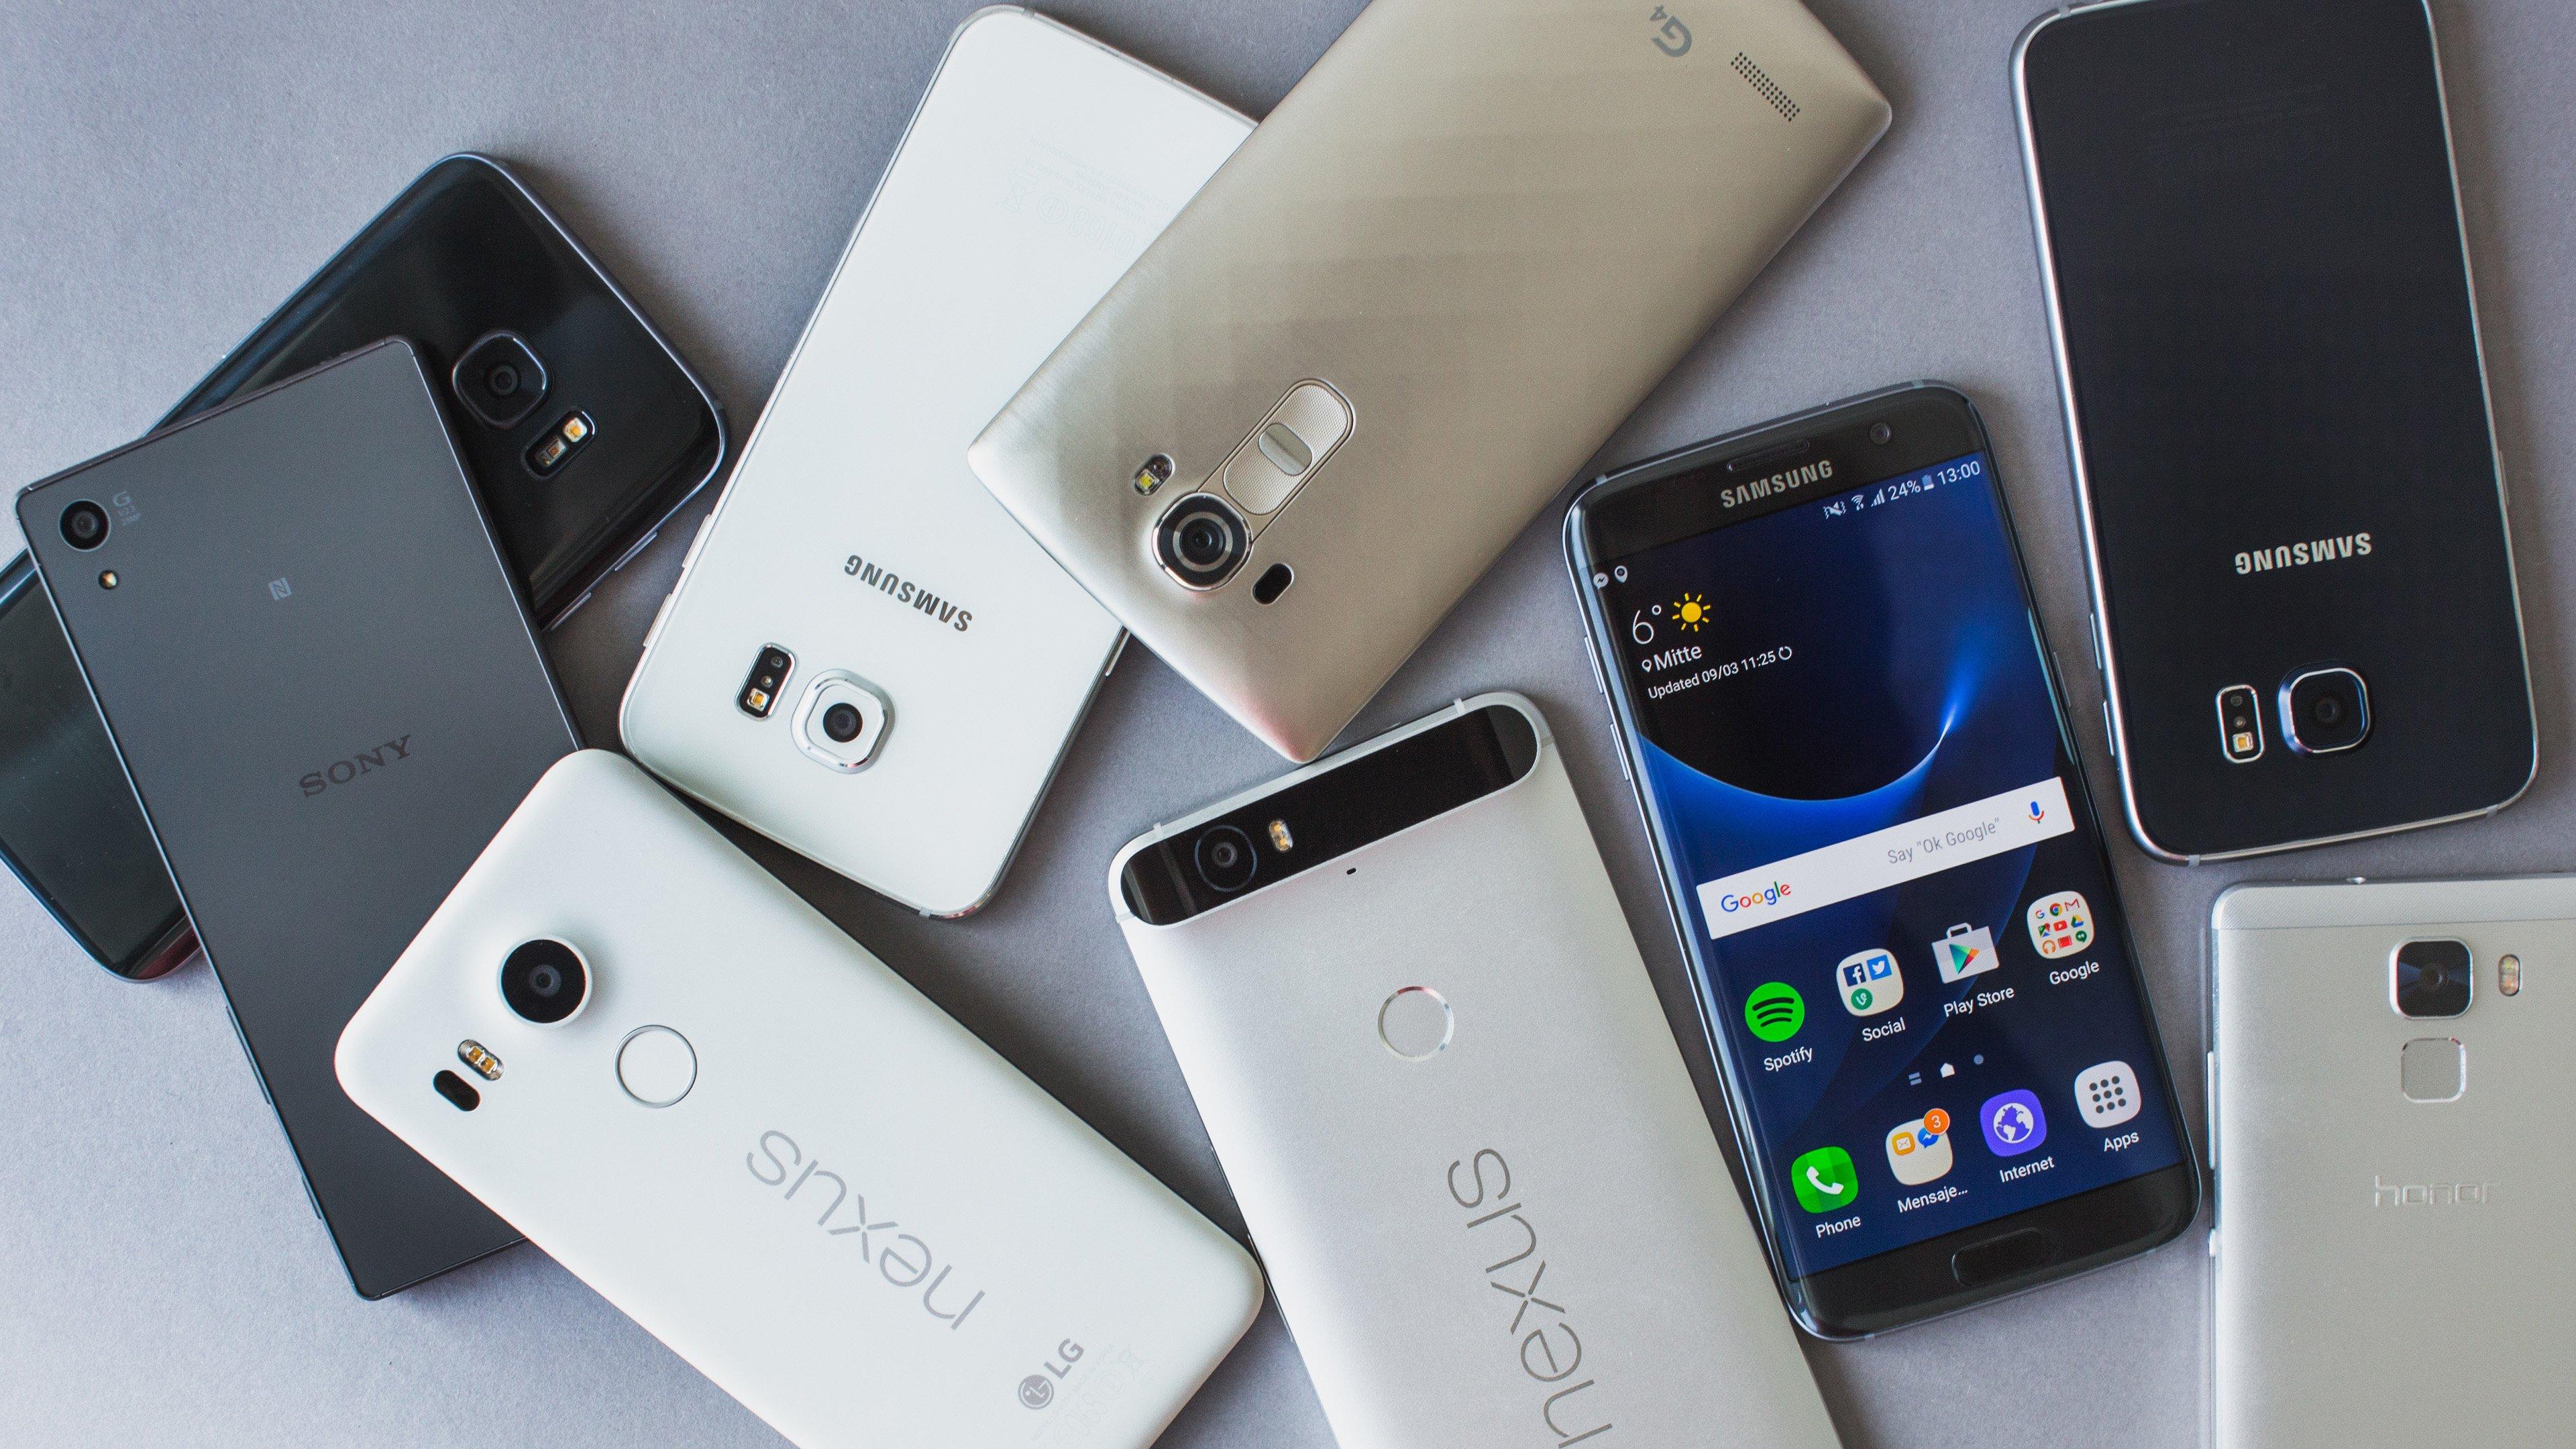 les meilleurs smartphones android en 2017 androidpit. Black Bedroom Furniture Sets. Home Design Ideas